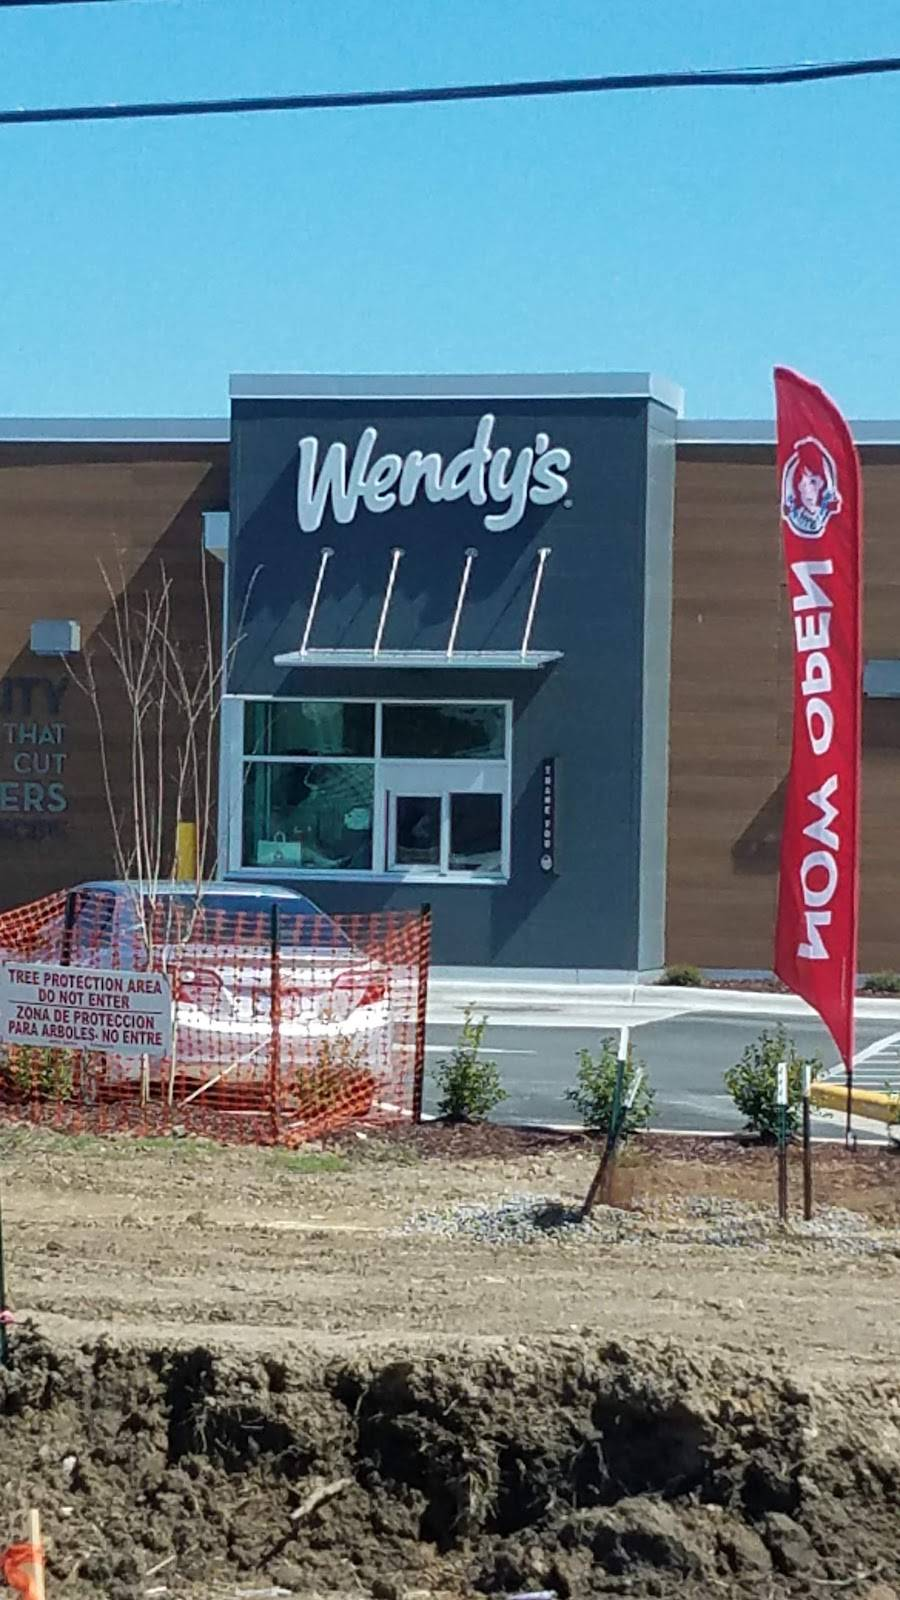 Wendys | restaurant | 800 Us 301 N, Wilson, NC 27893, USA | 2526402031 OR +1 252-640-2031